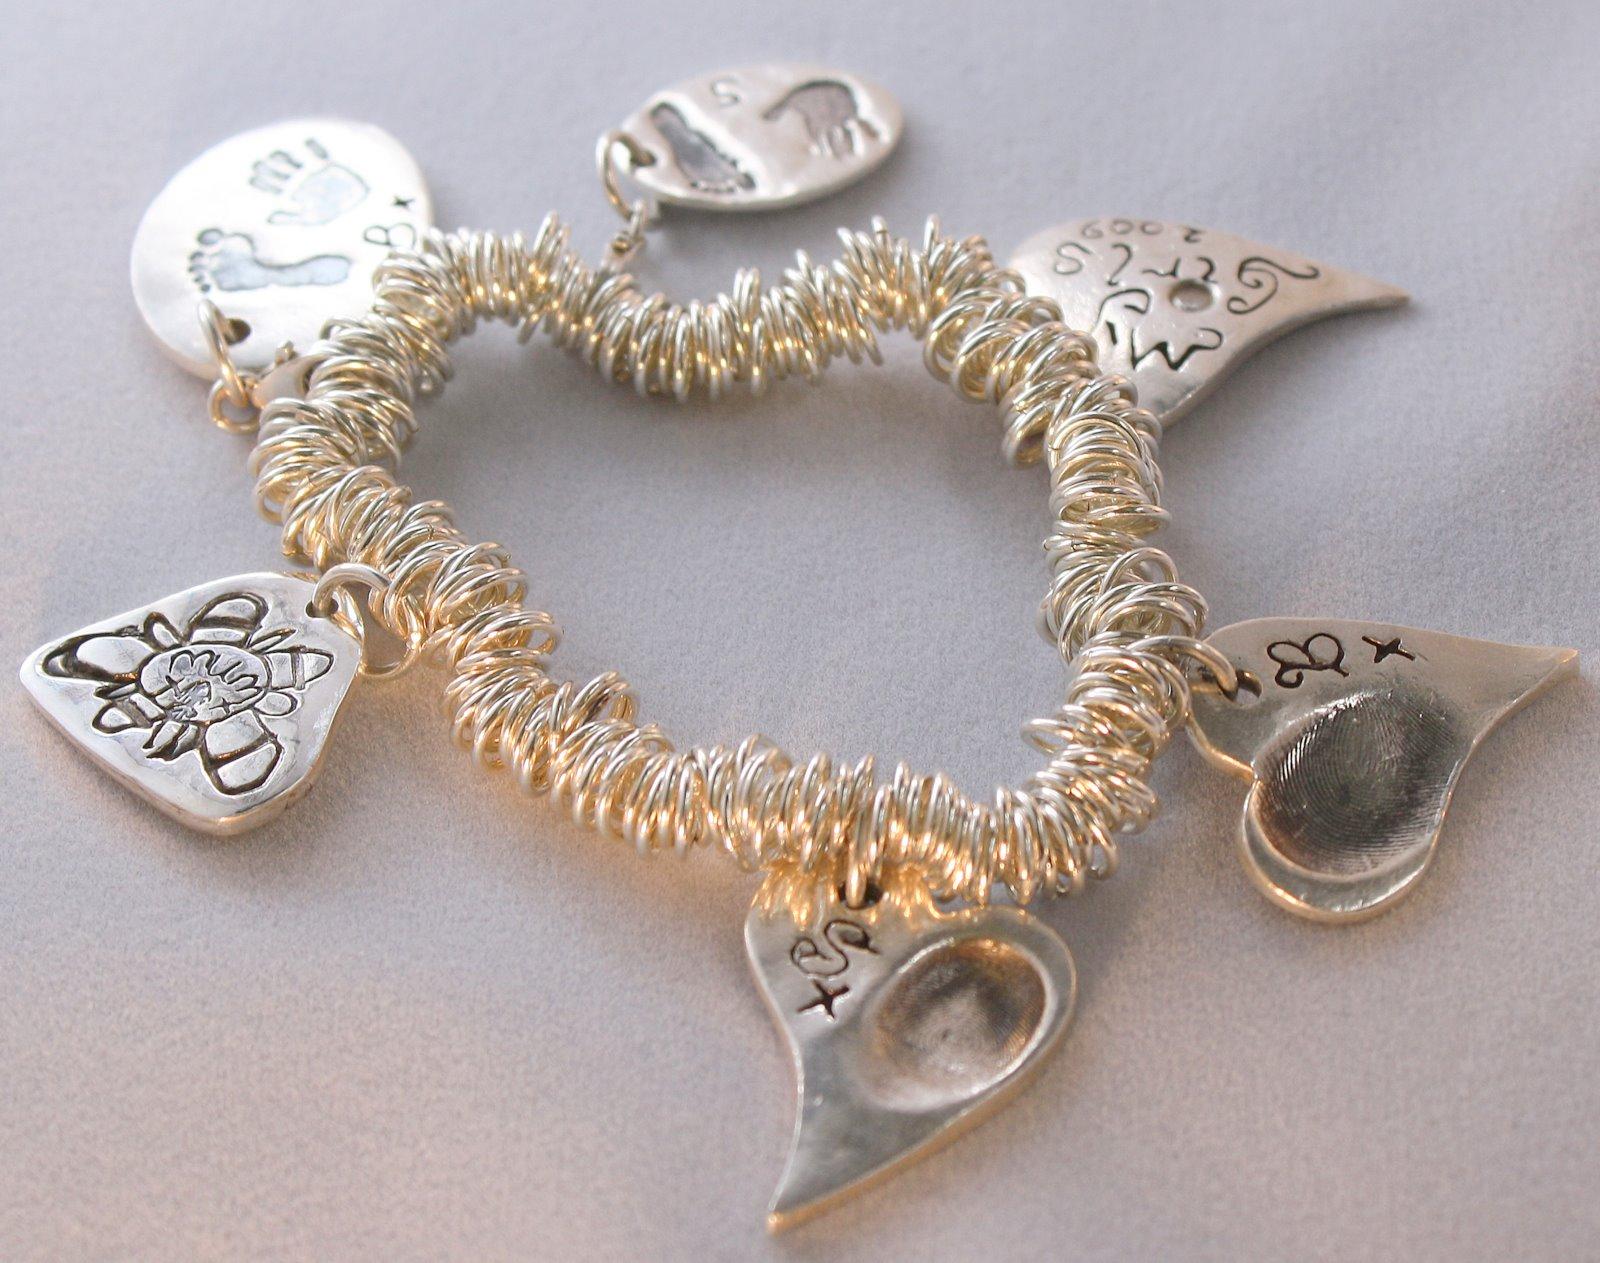 jewellery stores, jewellery online, jewellery fashion, indian jewellery designs, indian jewellery, jewellery definition, jewellery making, jewellery exchange-113